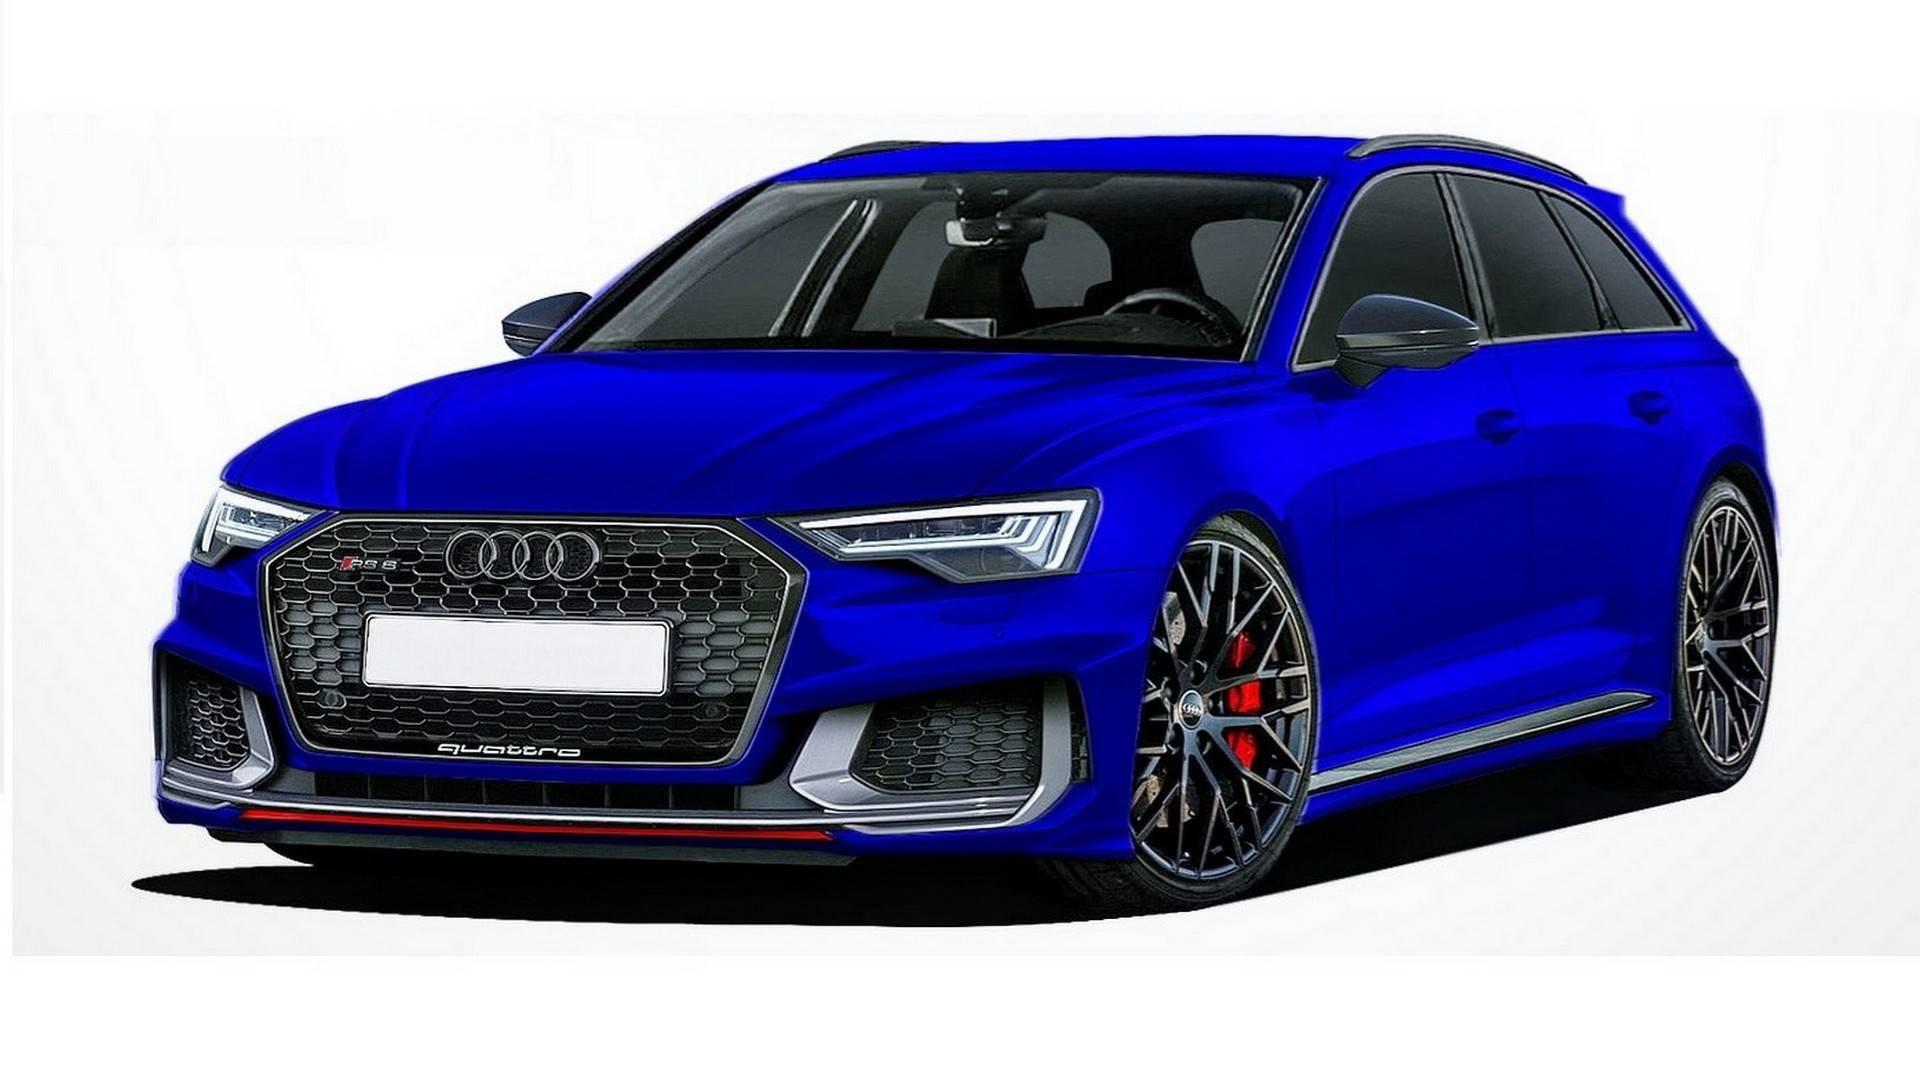 Audi A6 Avant, A6 Allroad RS6 Avant Renderings (5)